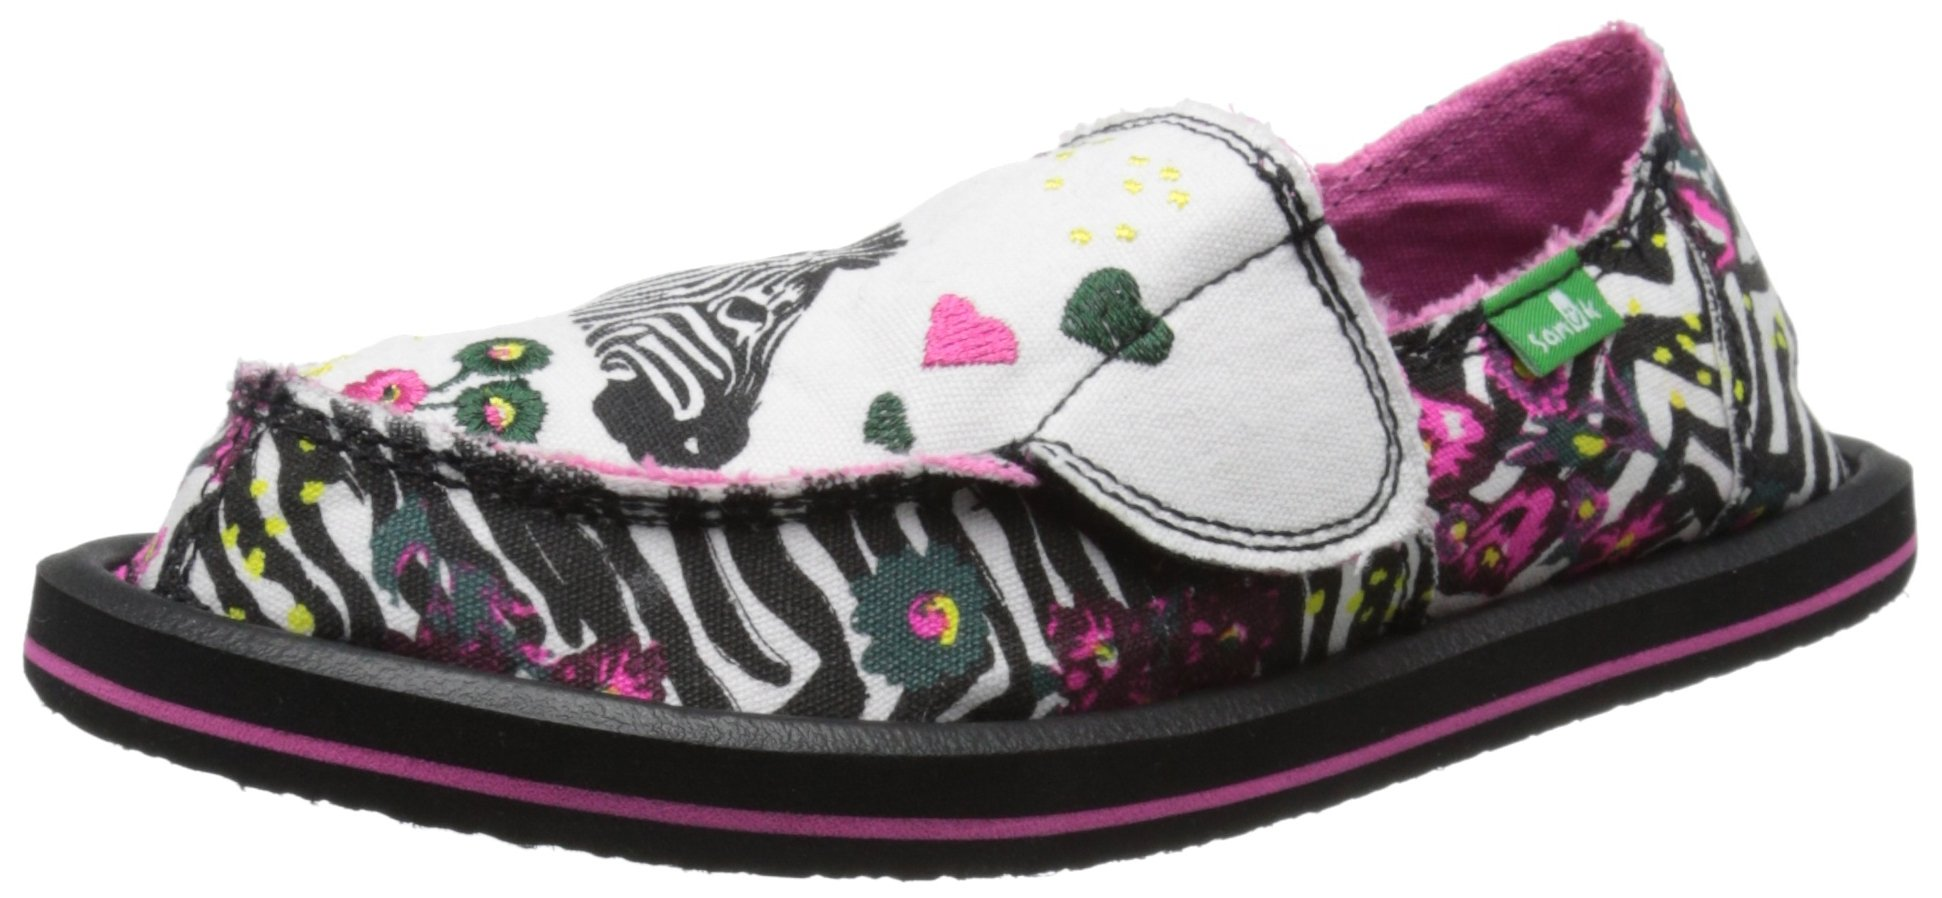 Sanuk Kids Scribble LL Girls Sidewalk Surfer Shoe (Toddler/Little Kid/Big Kid), Zebra Floral, 2 M US Little Kid